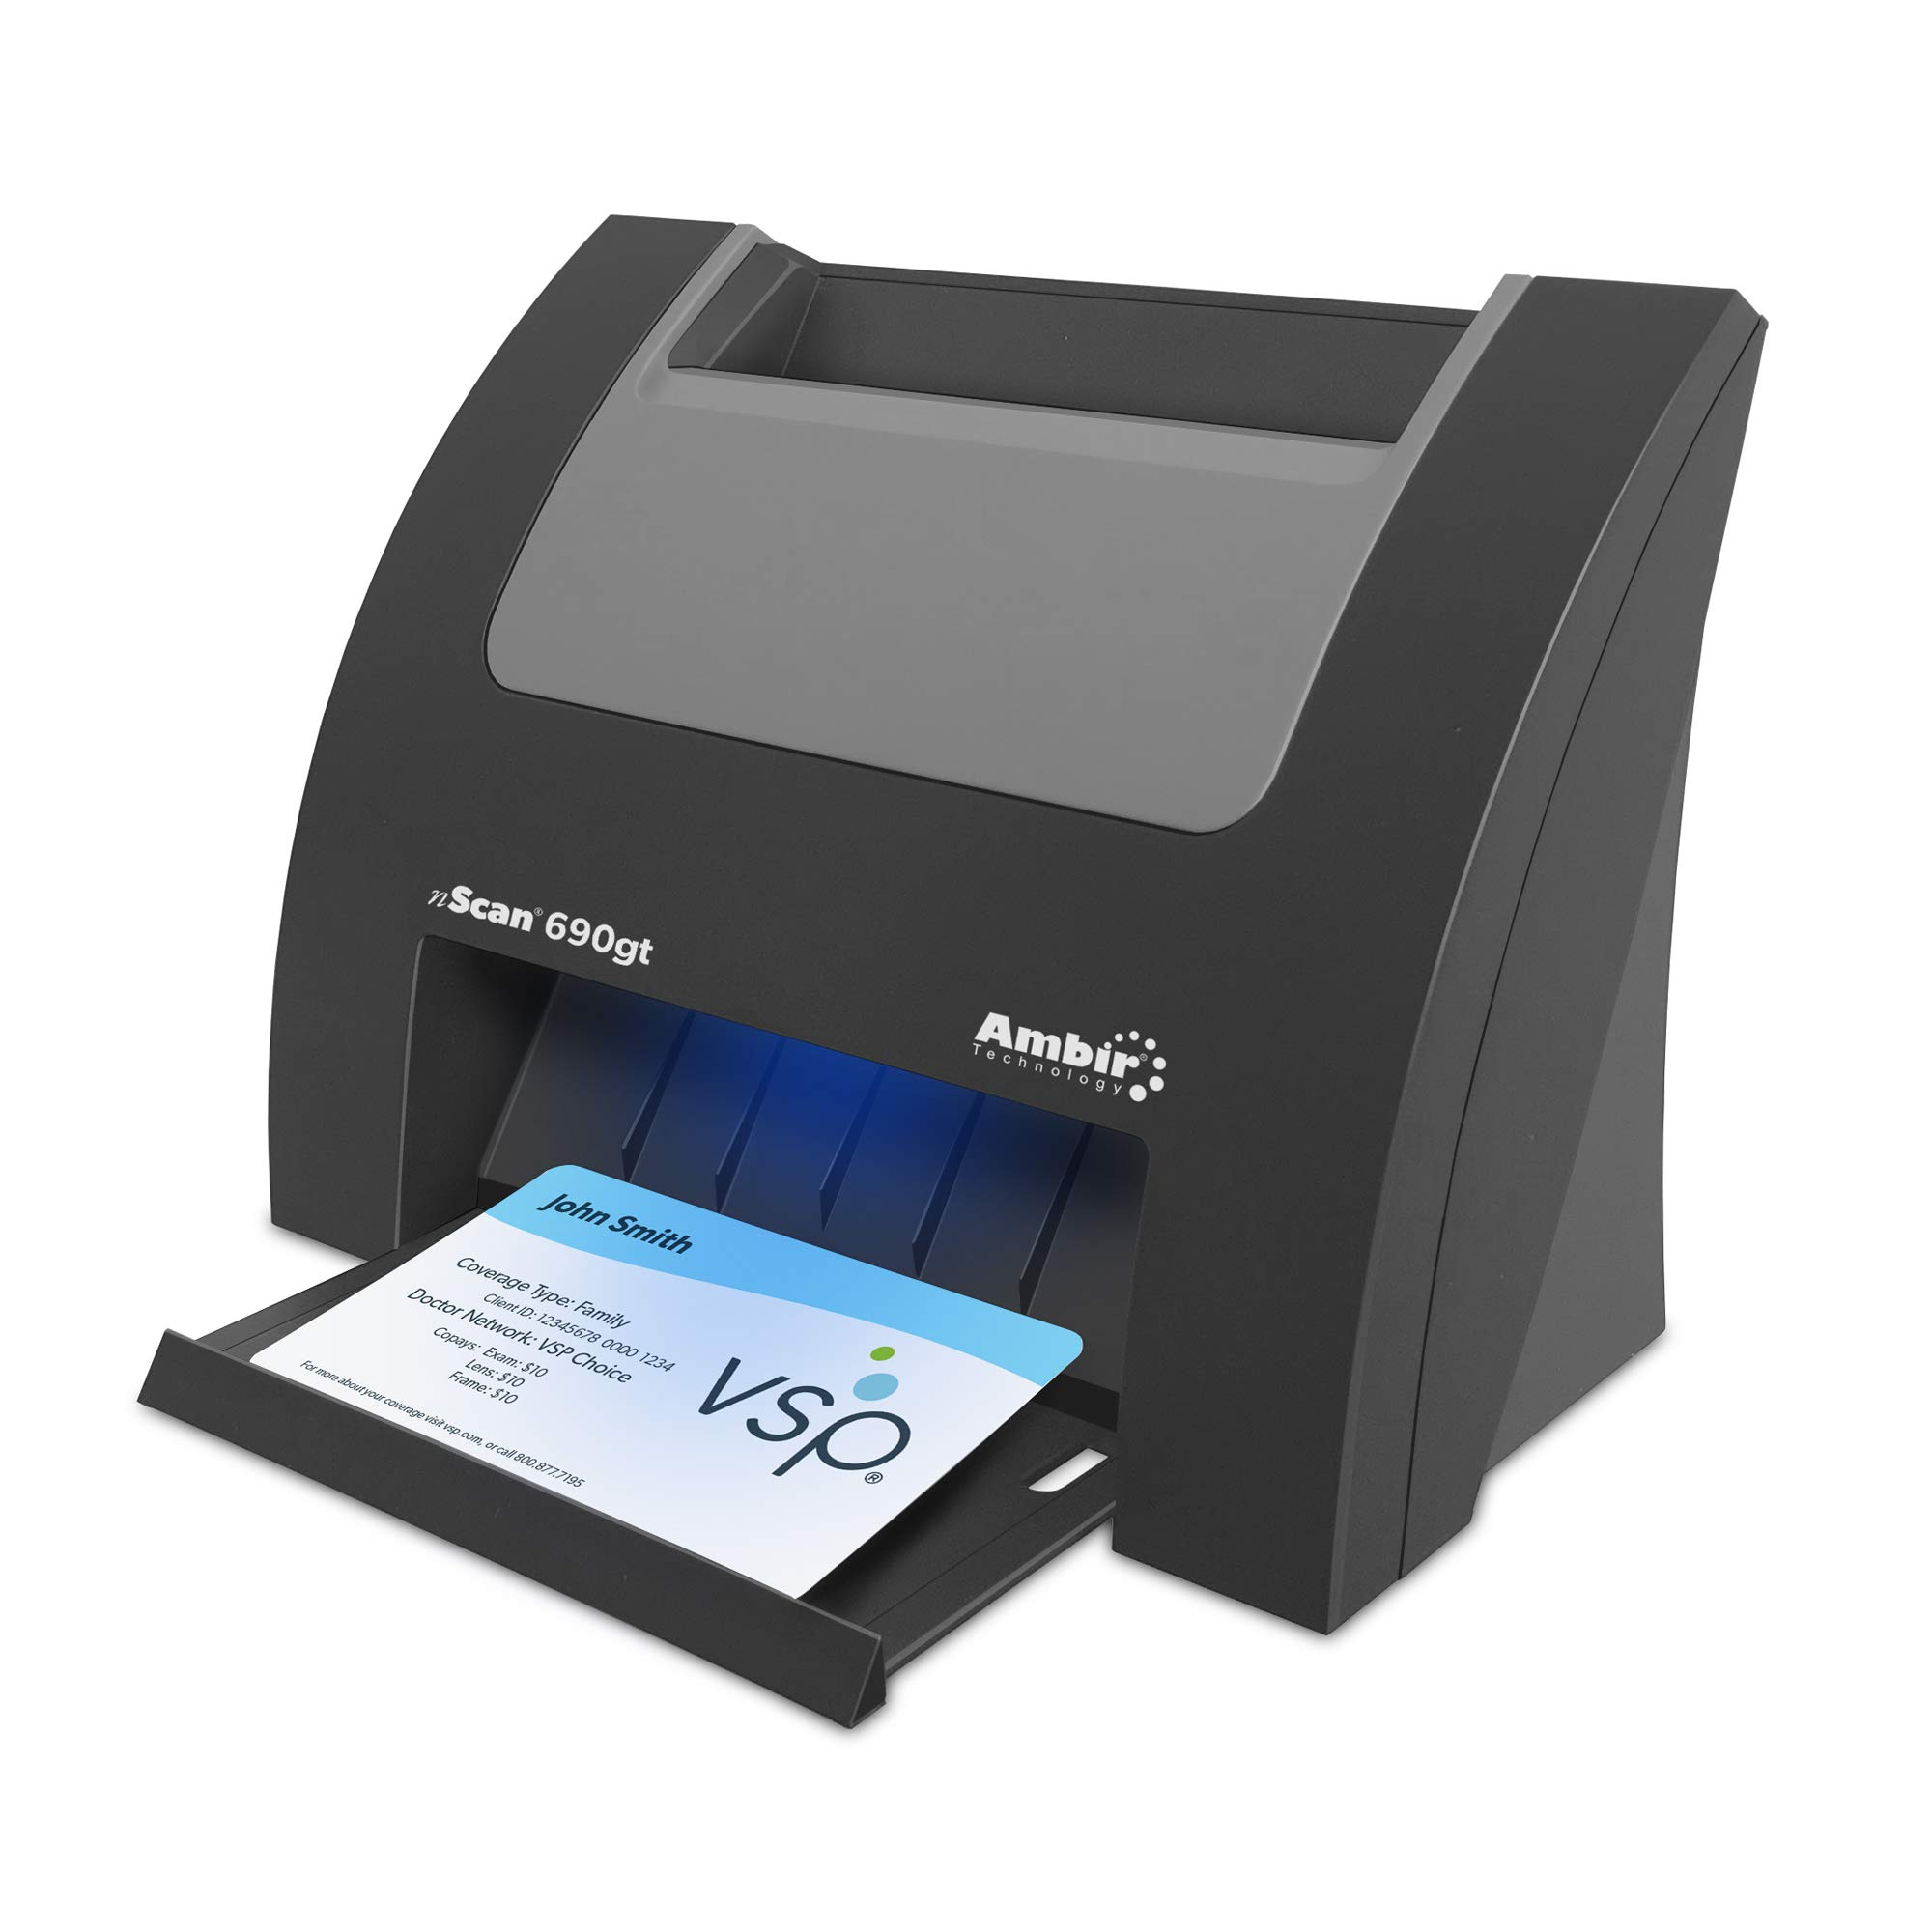 Ambir nScan 690gt High-Speed Vertical Card Scanner with AmbirScan Business Card Reader